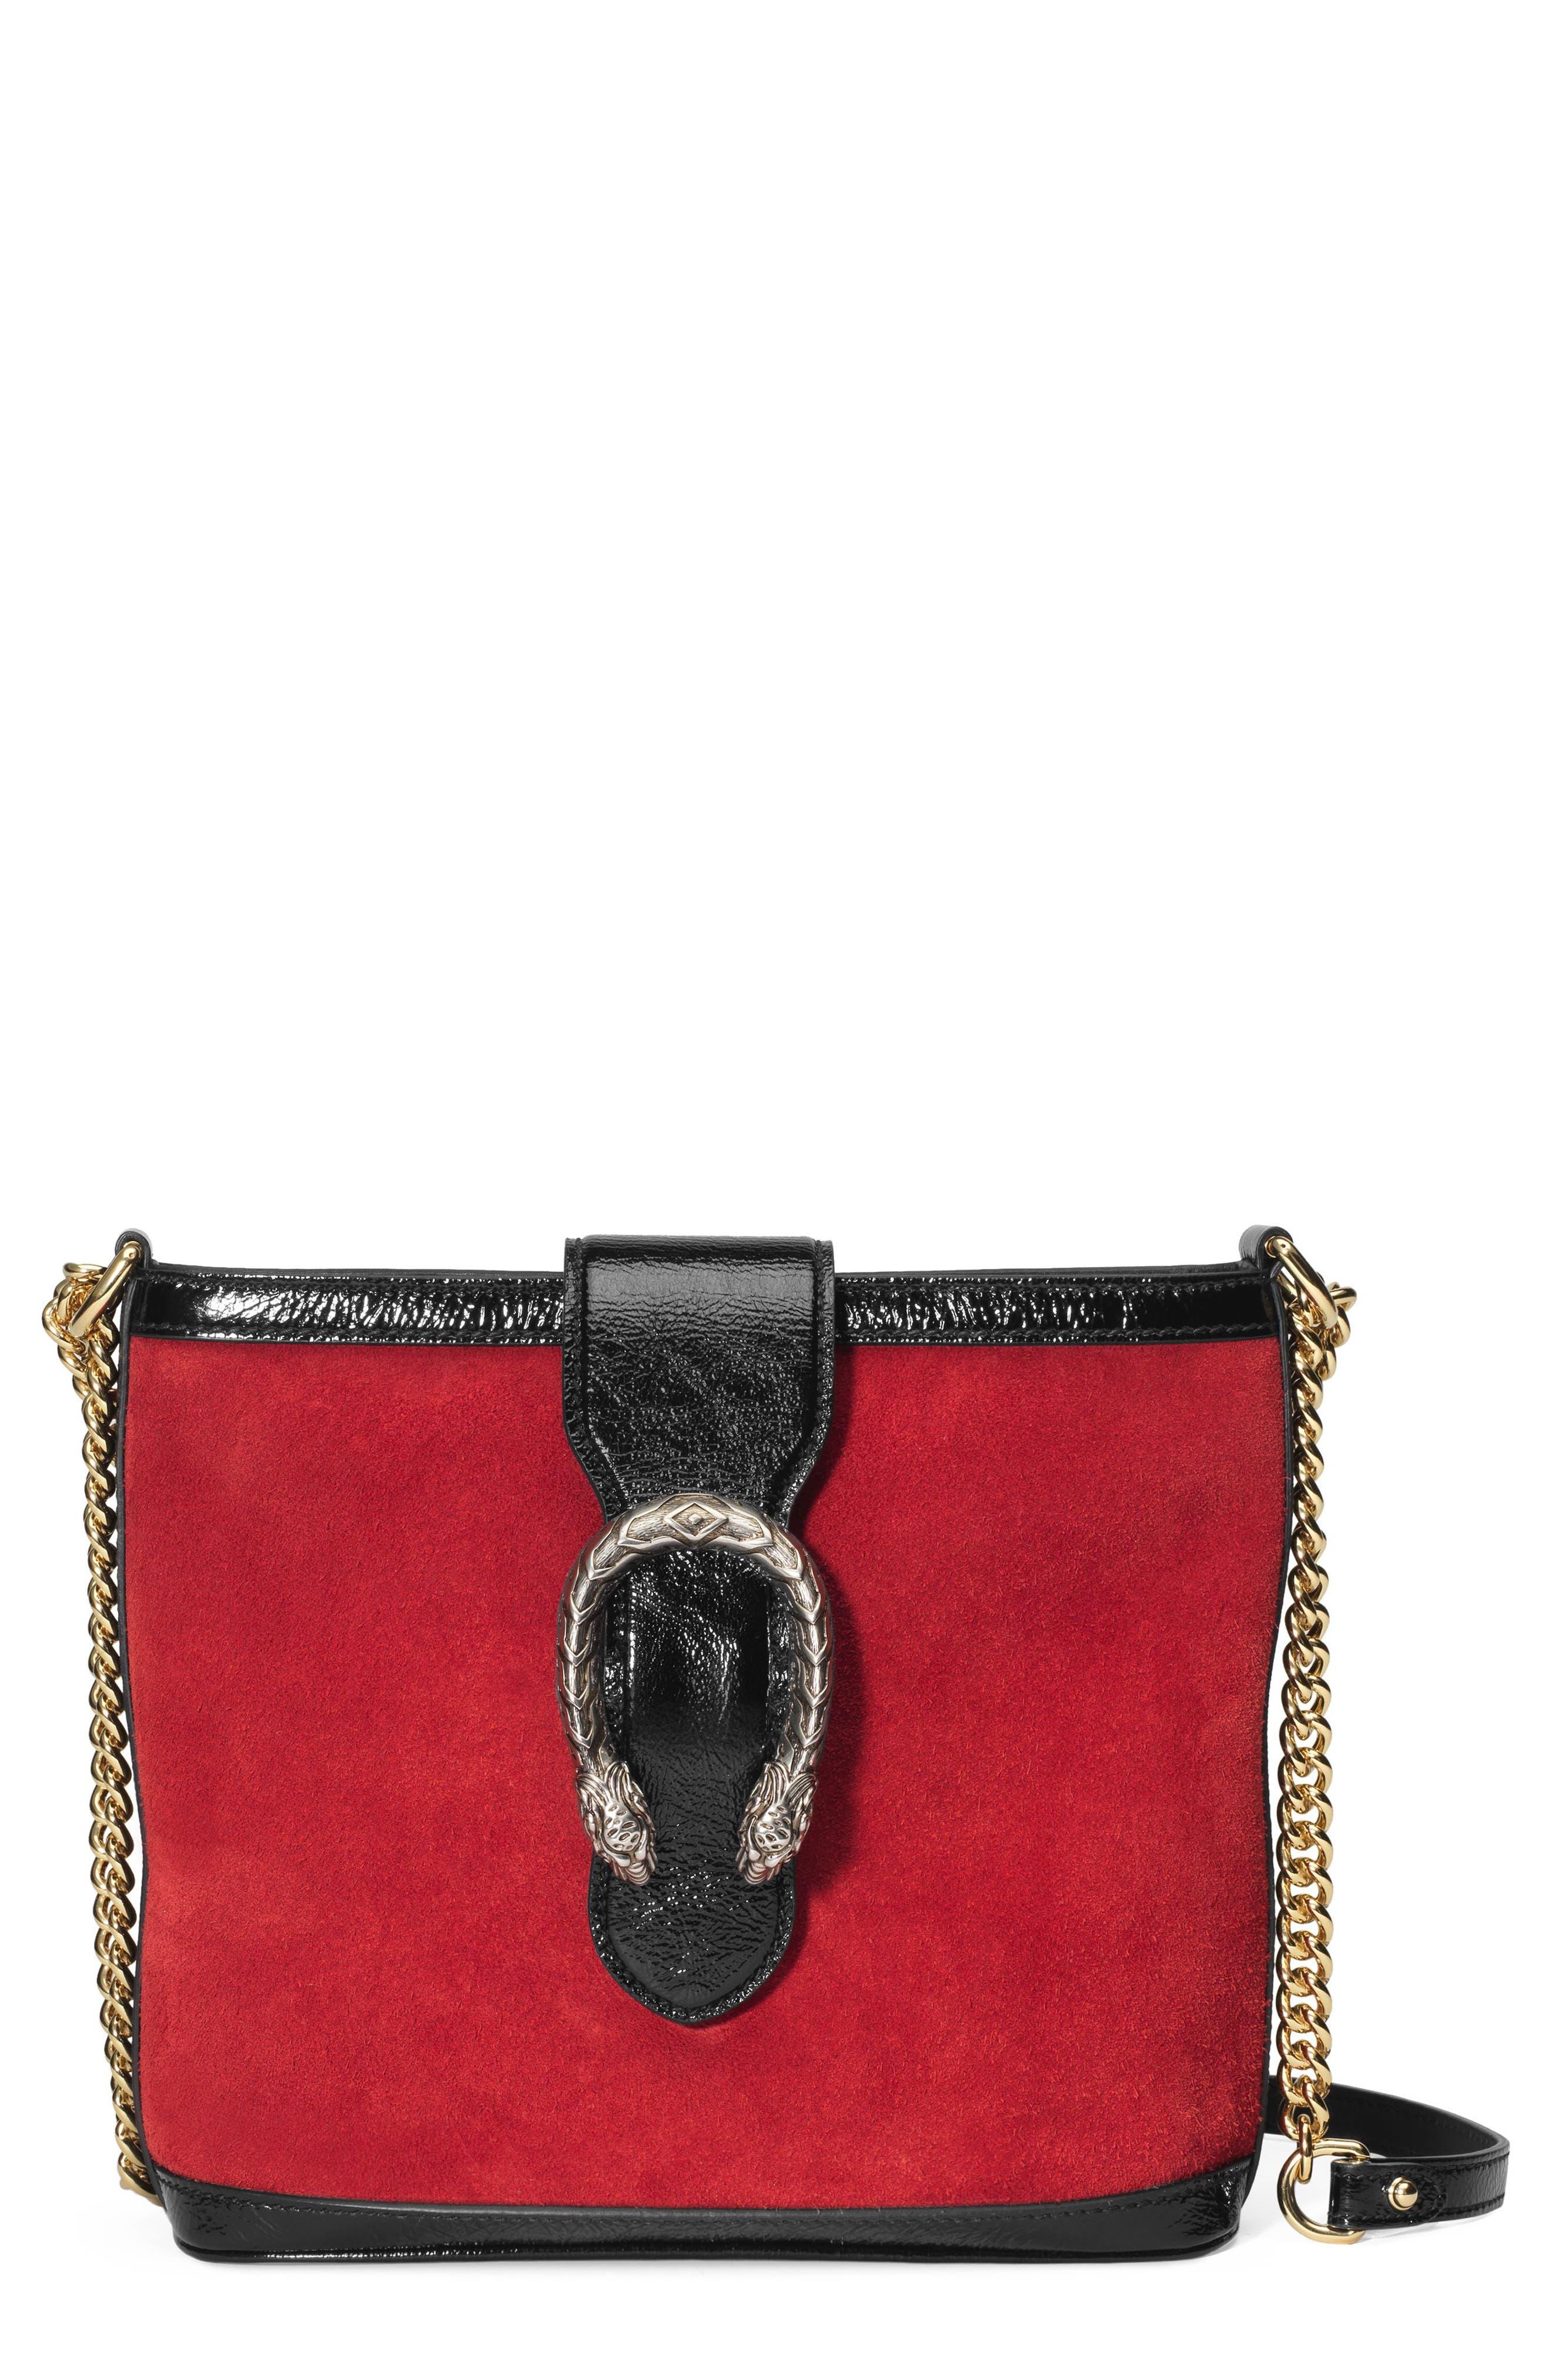 GUCCI,                             Medium Dionysus Suede Shoulder Bag,                             Main thumbnail 1, color,                             HIBISCUS RED/ NERO